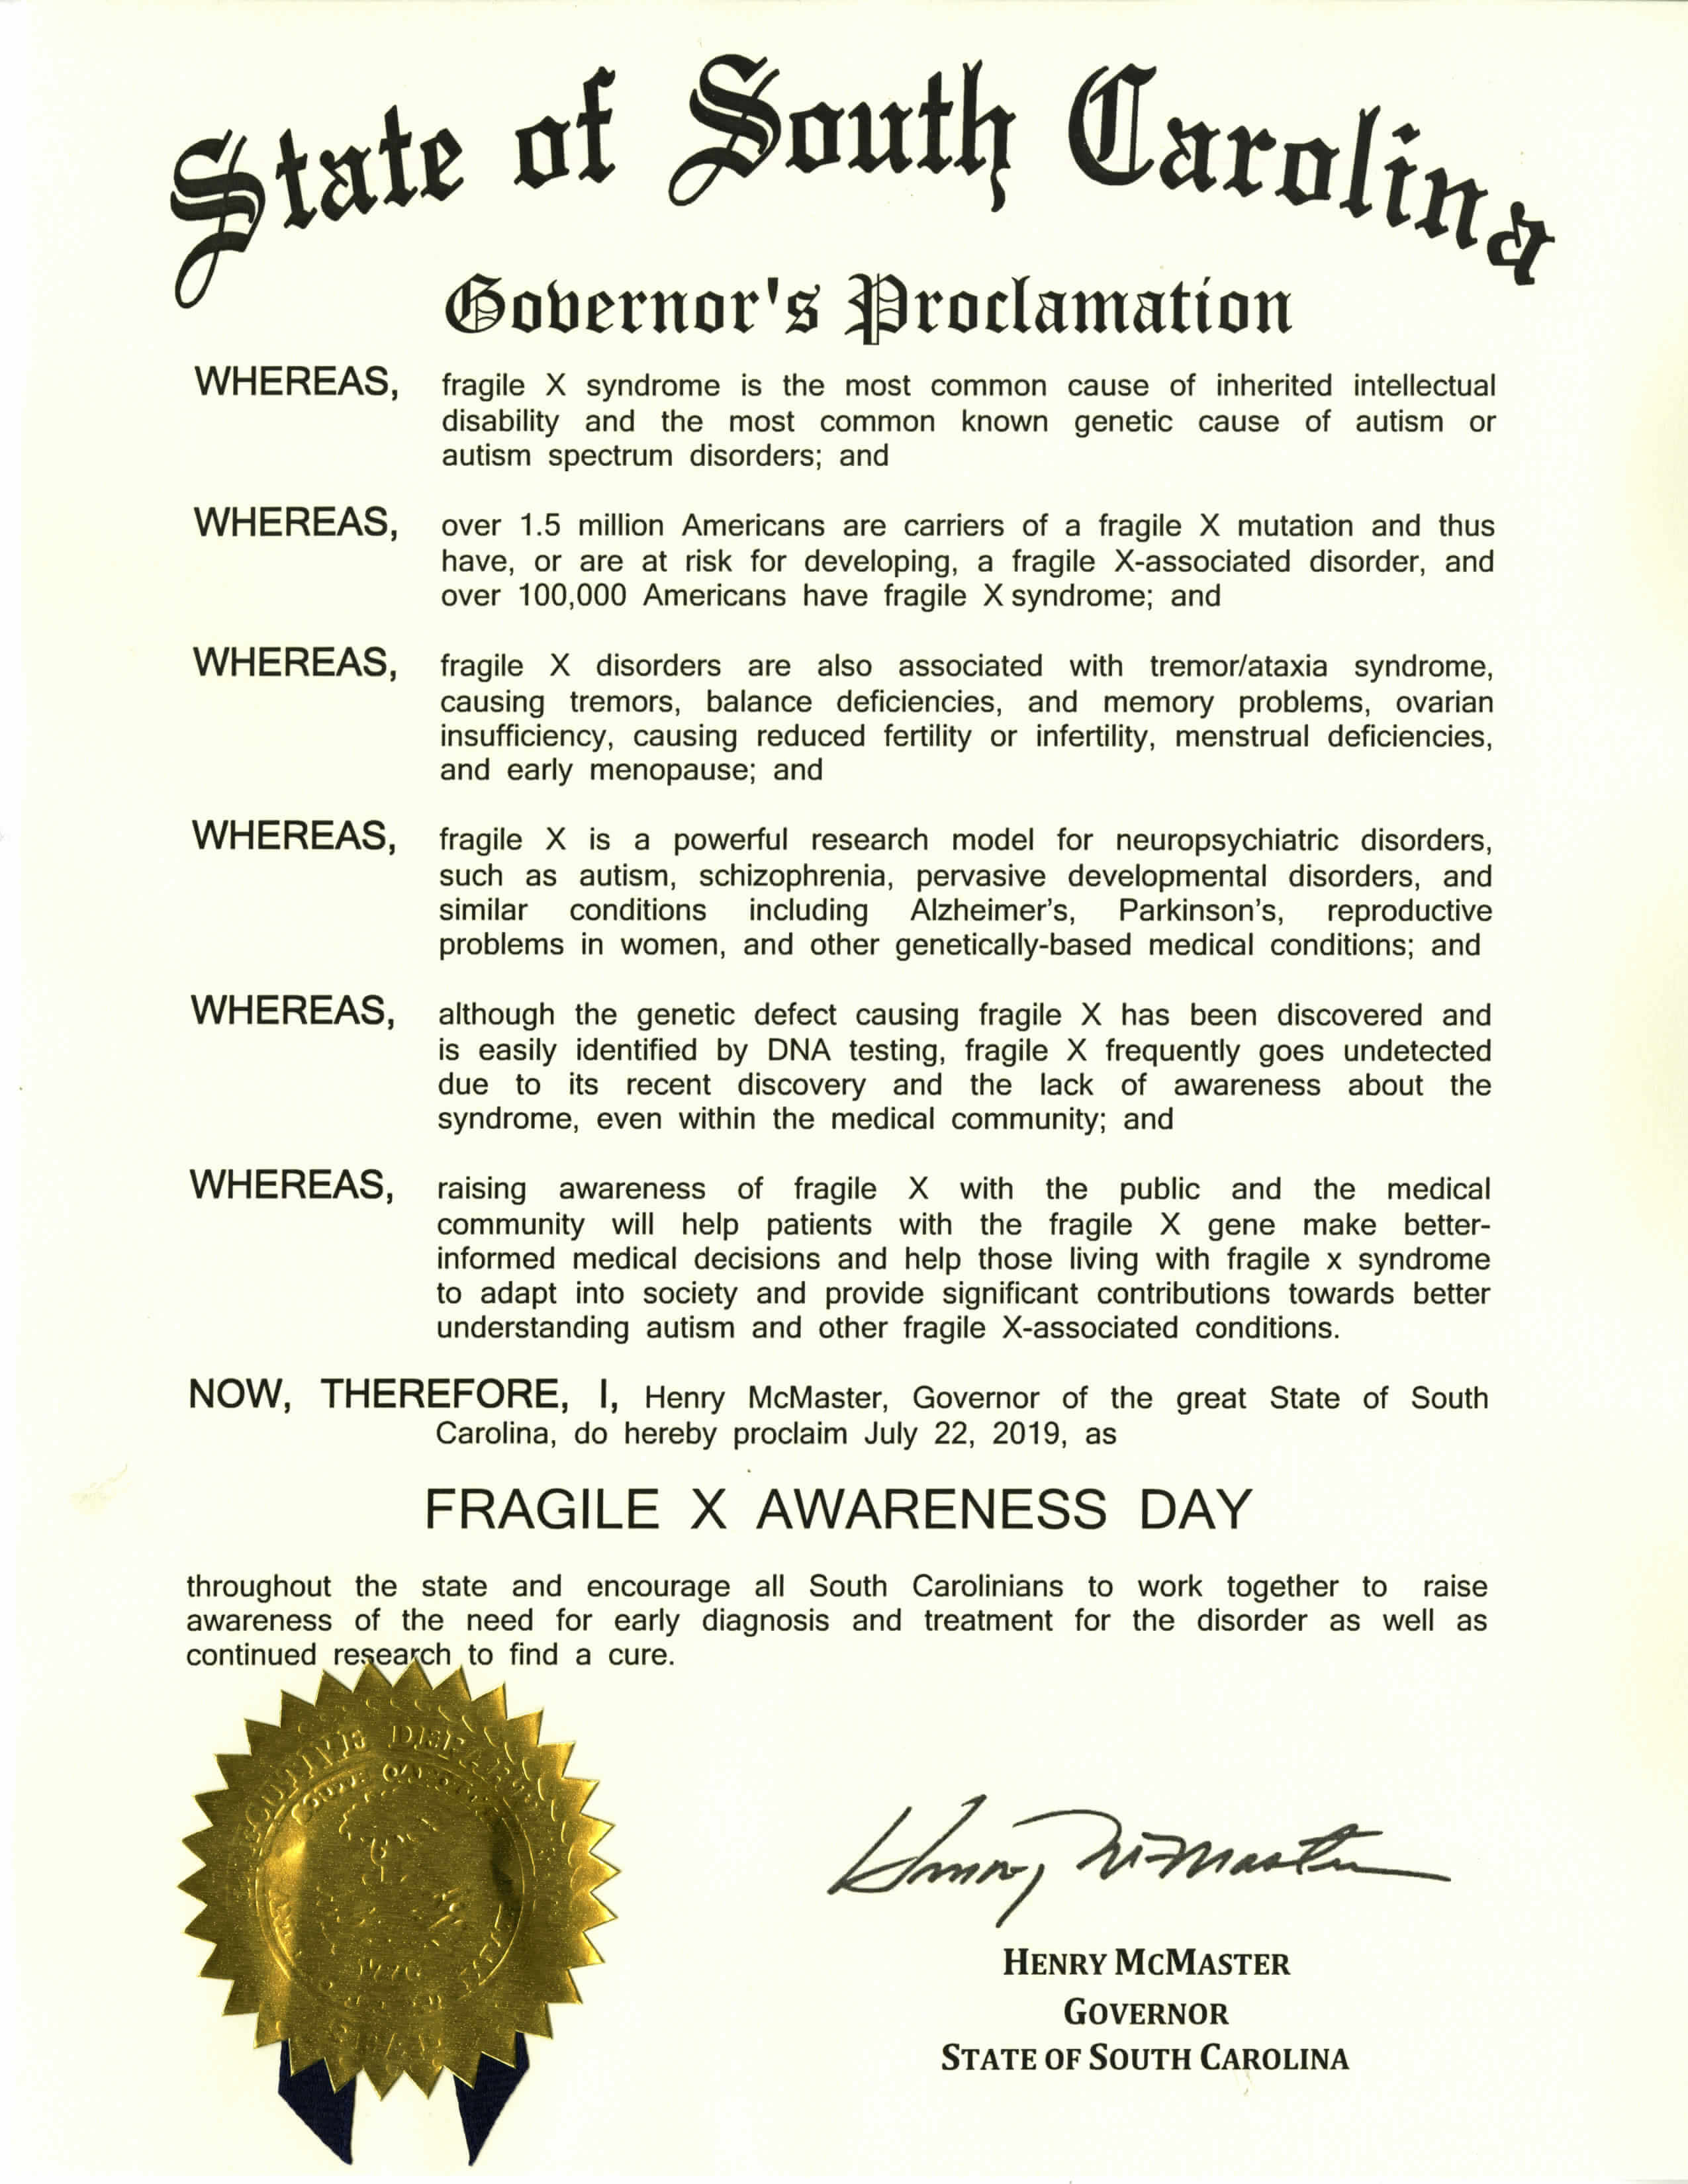 South Carolina Fragile X Awareness Day 2019 proclamation